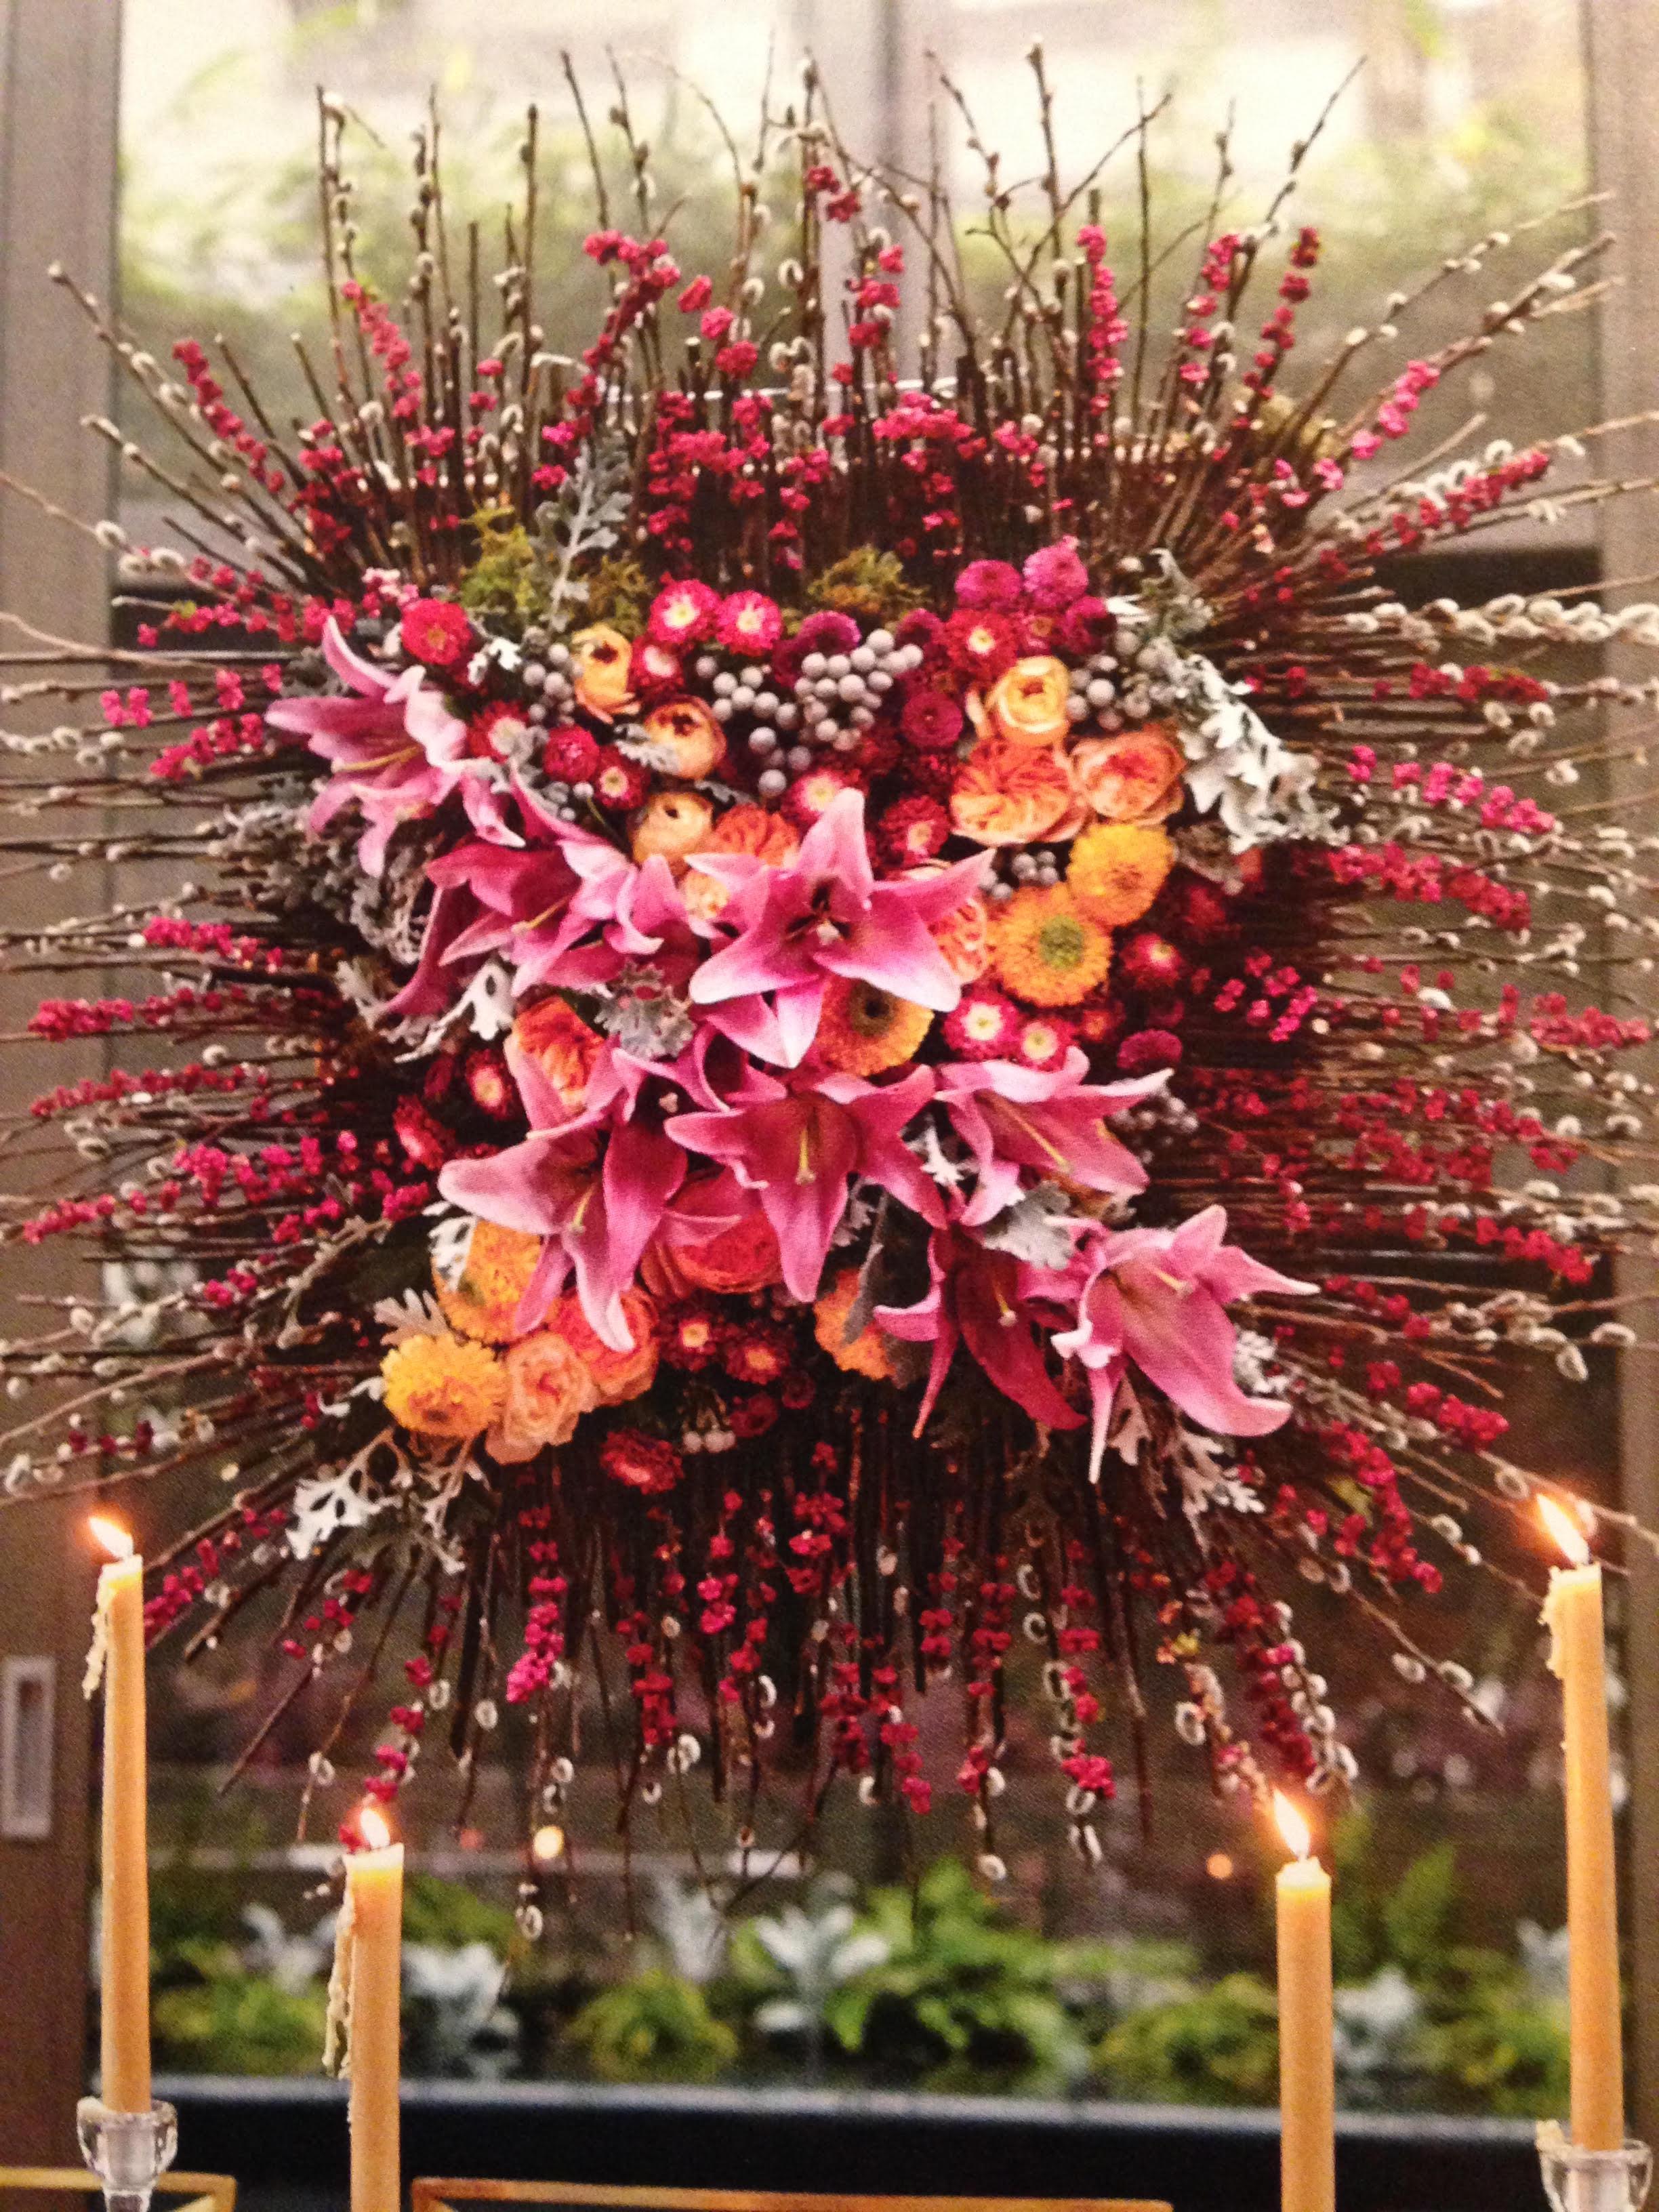 vases wild is featured in seattle met bride groom magazine tobey nelson weddings events. Black Bedroom Furniture Sets. Home Design Ideas